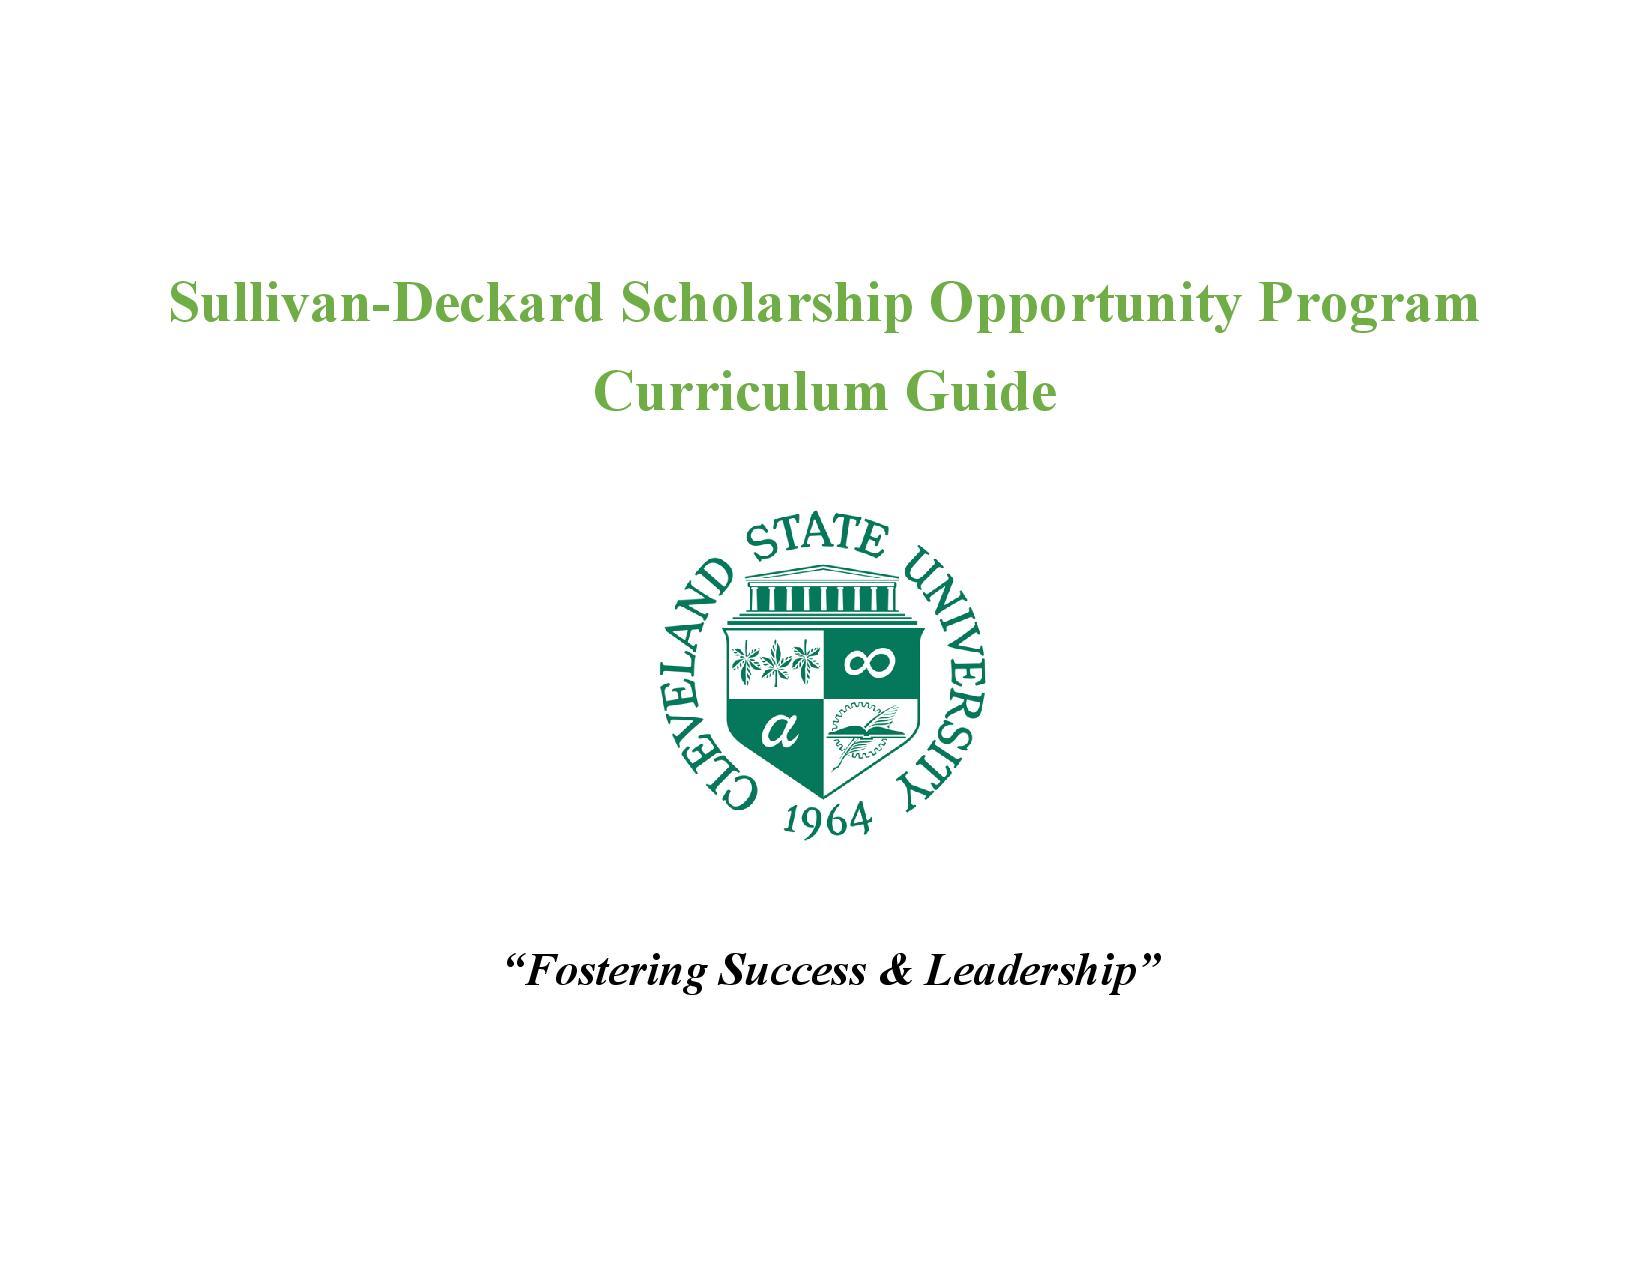 Suliivan-Deckard Scholarship Curriculum Guide